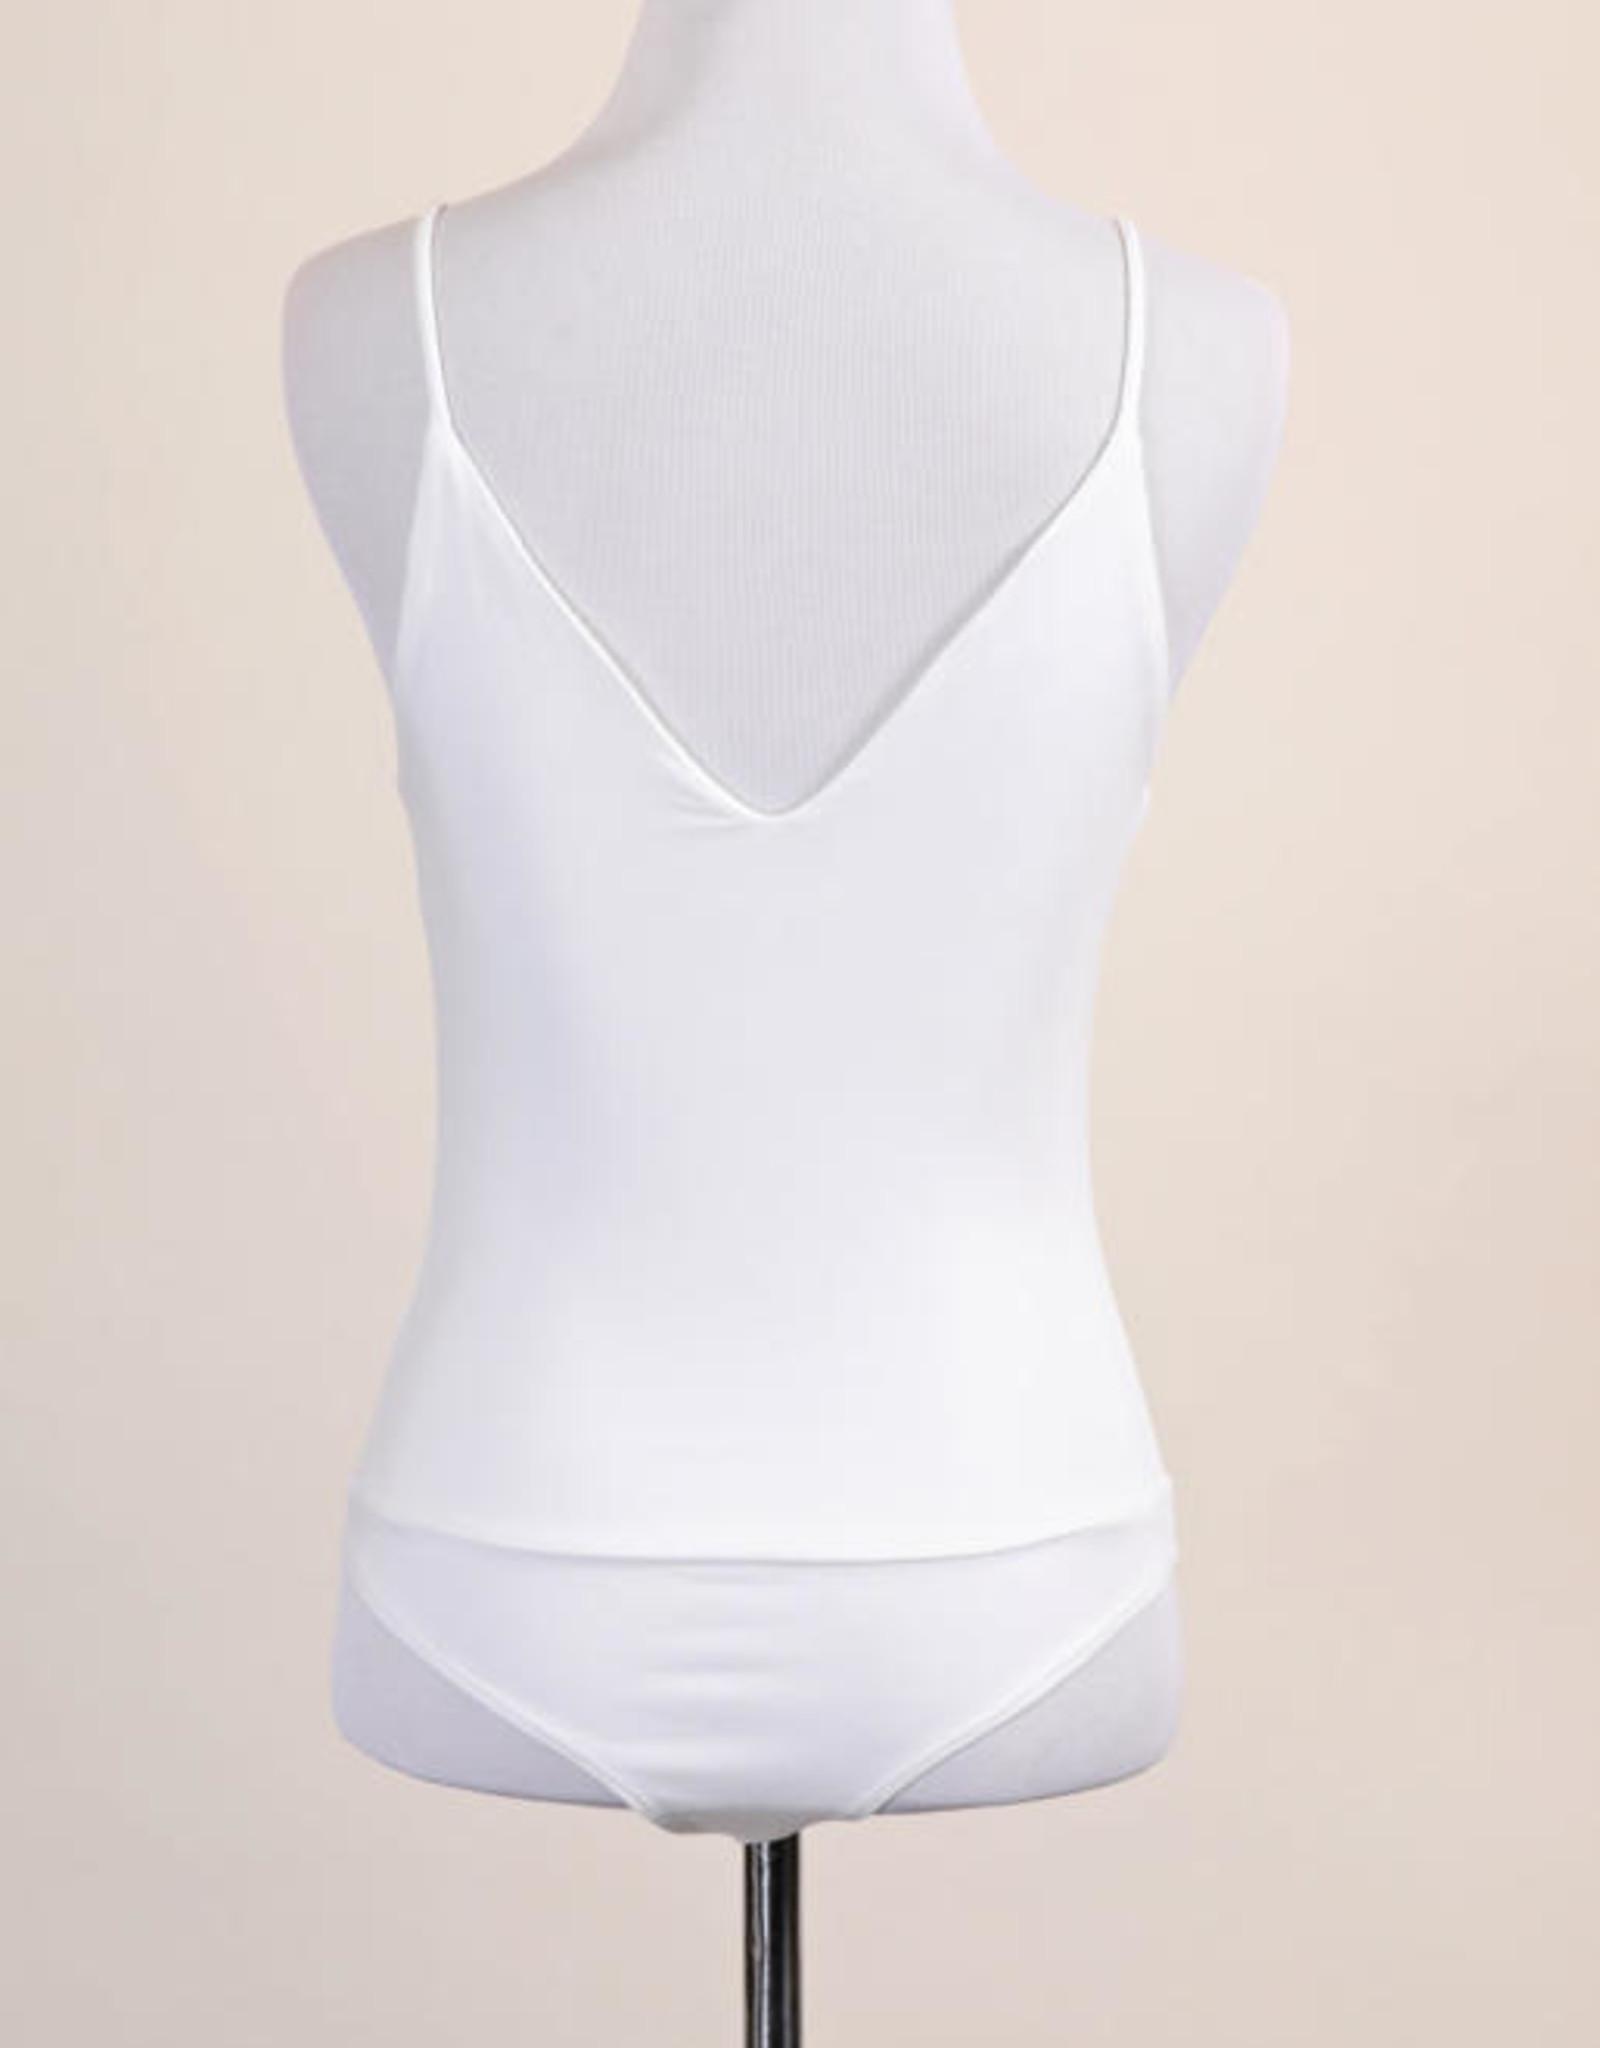 Final Touch Cami Bodysuit